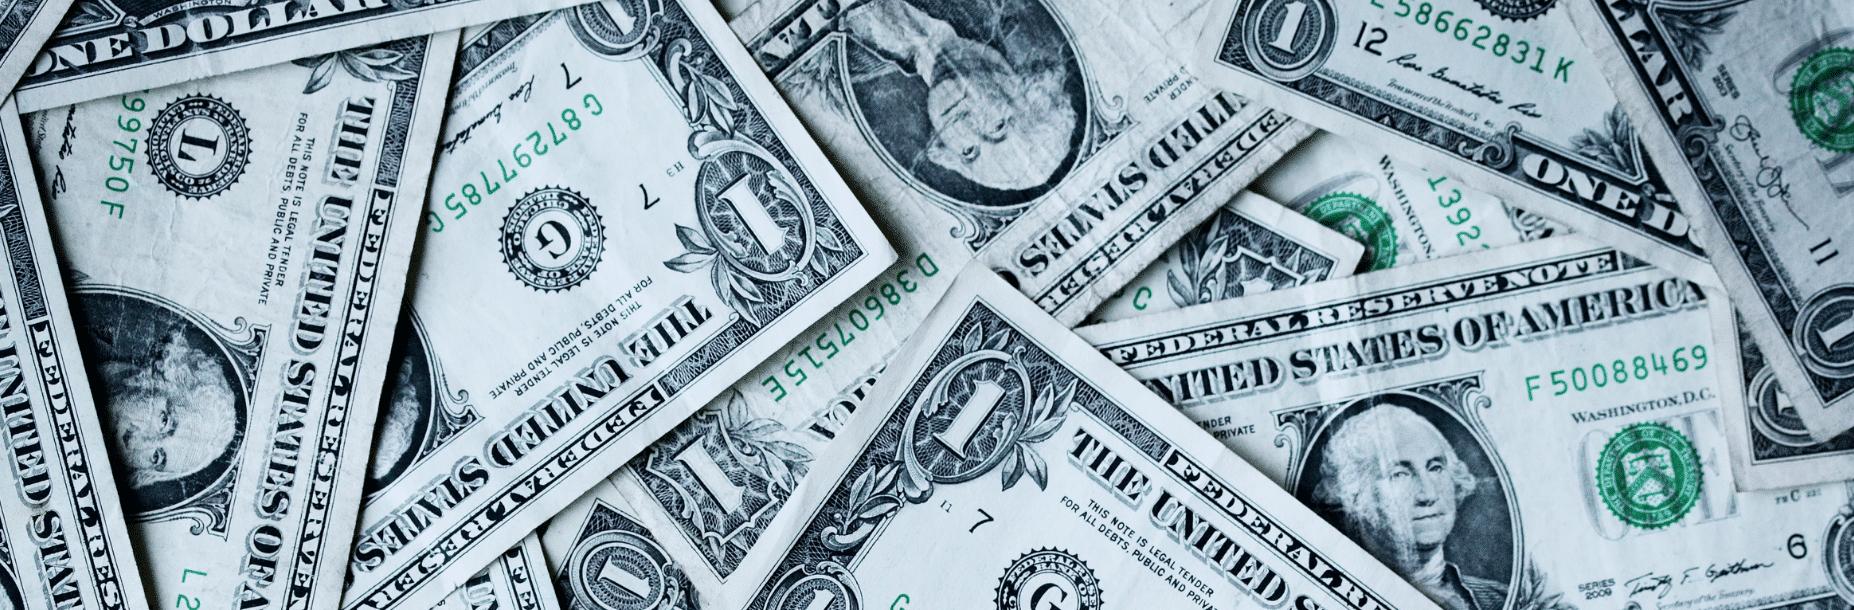 Helgspecial: Tre kampanjer fylld av kontanter